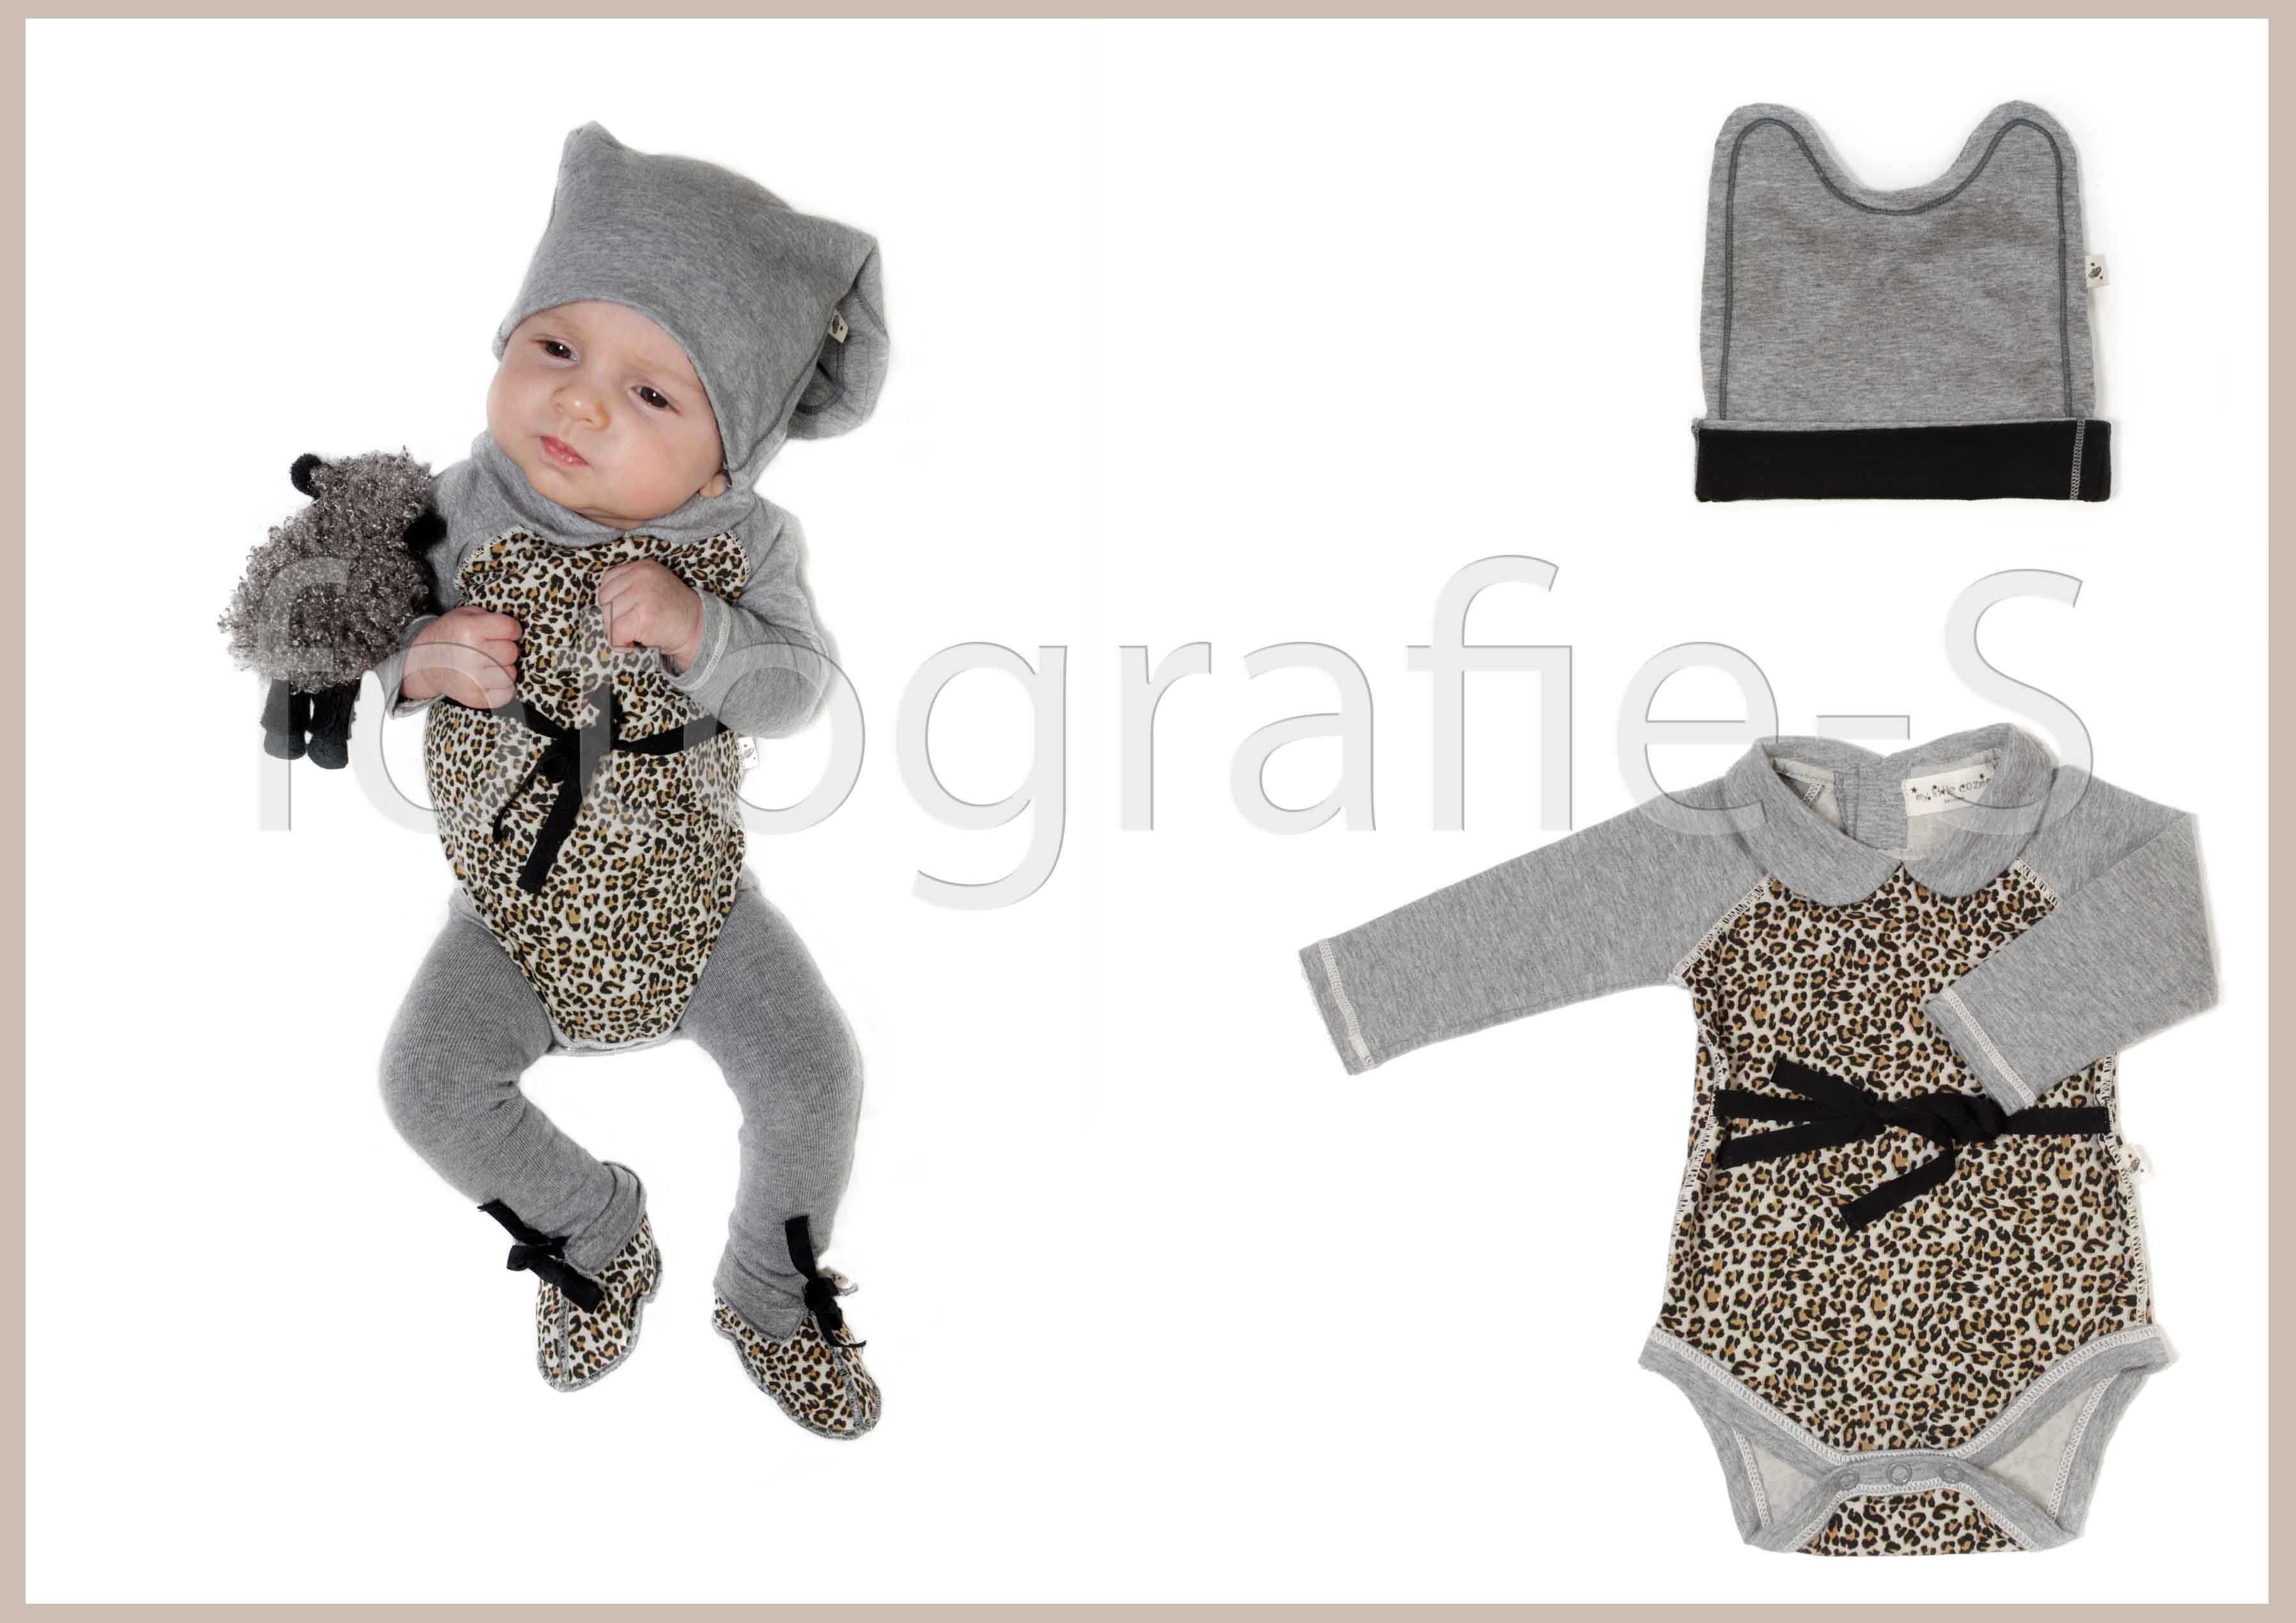 Little Cozmo kledinglijn productfoto